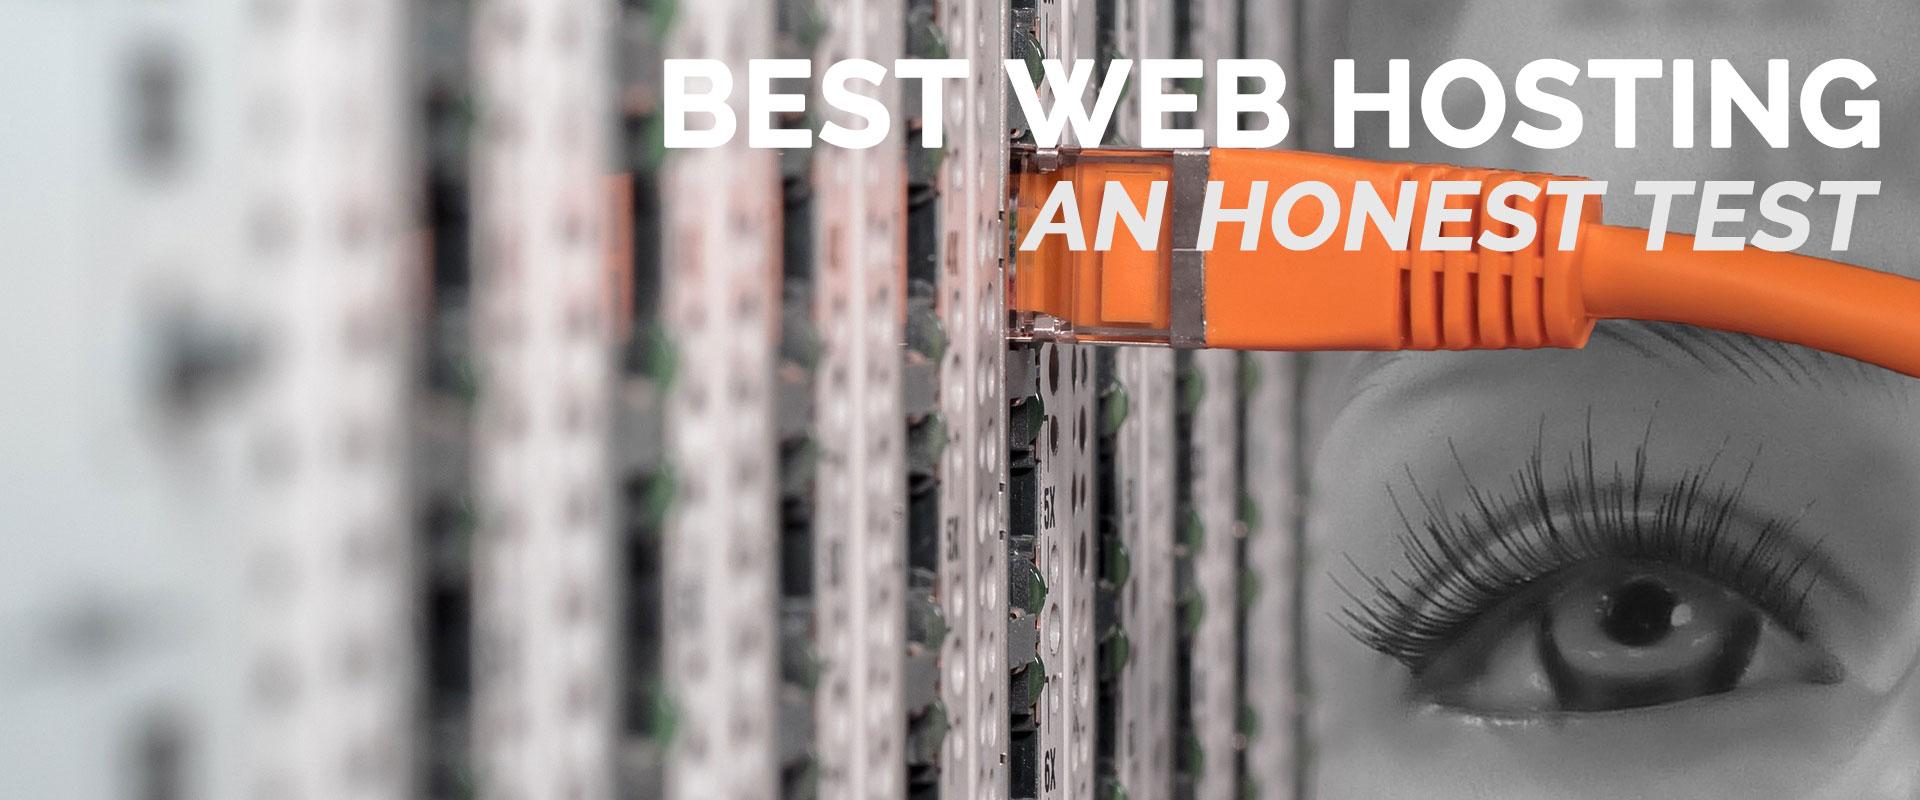 Best web hosting - an honest test